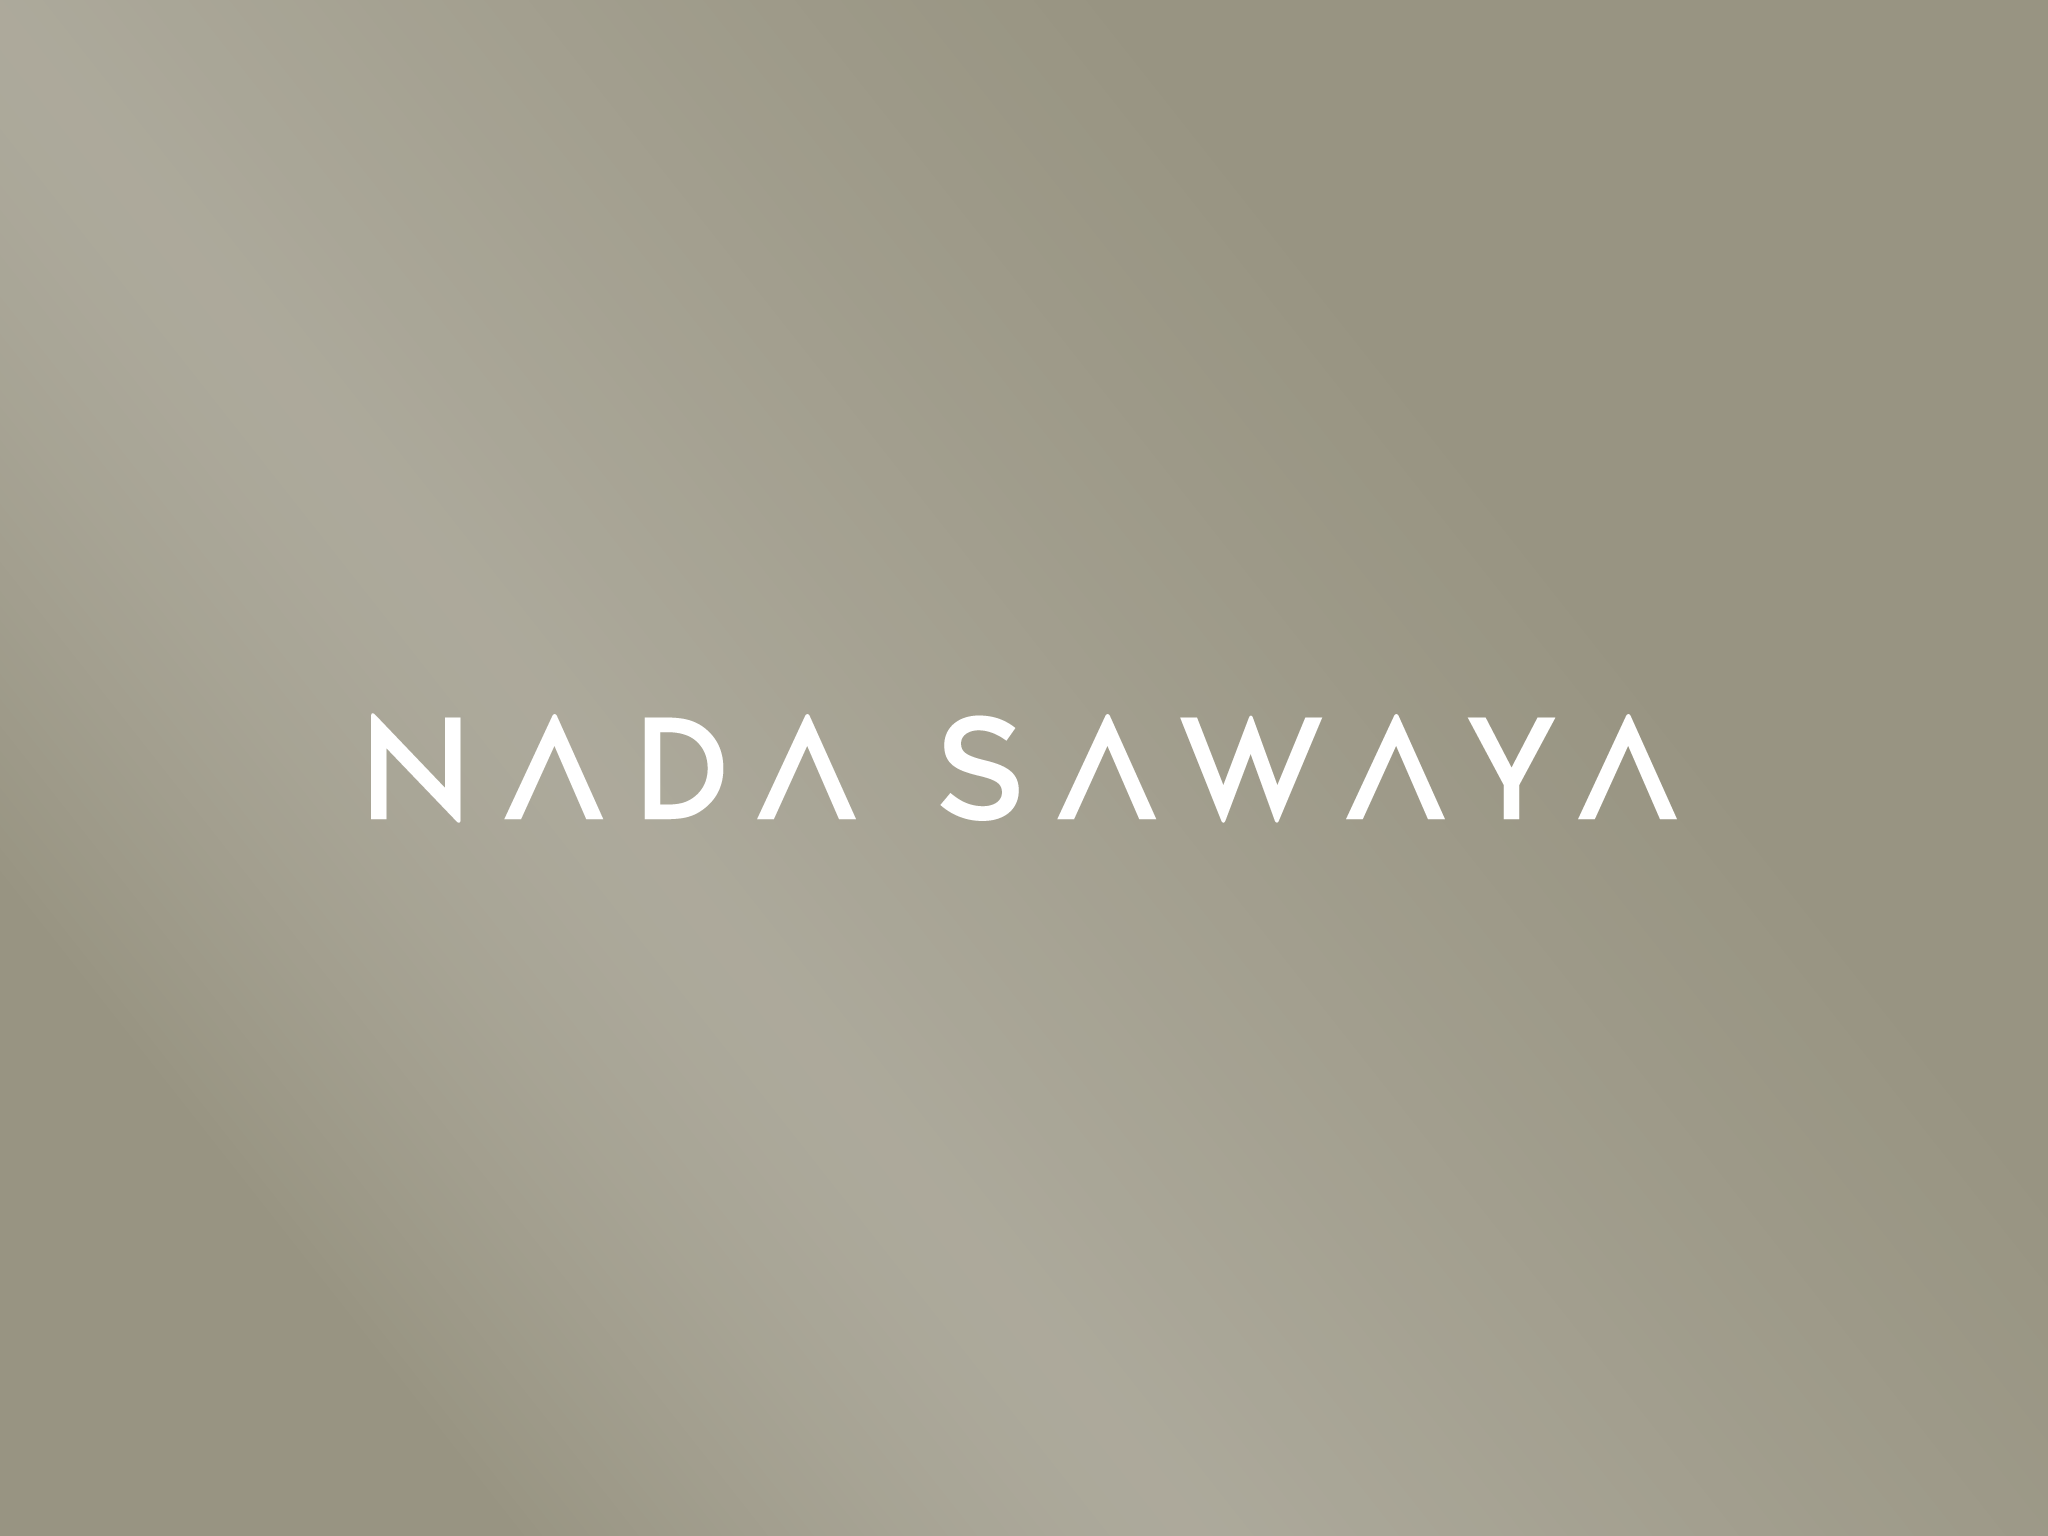 Nada Sawaya